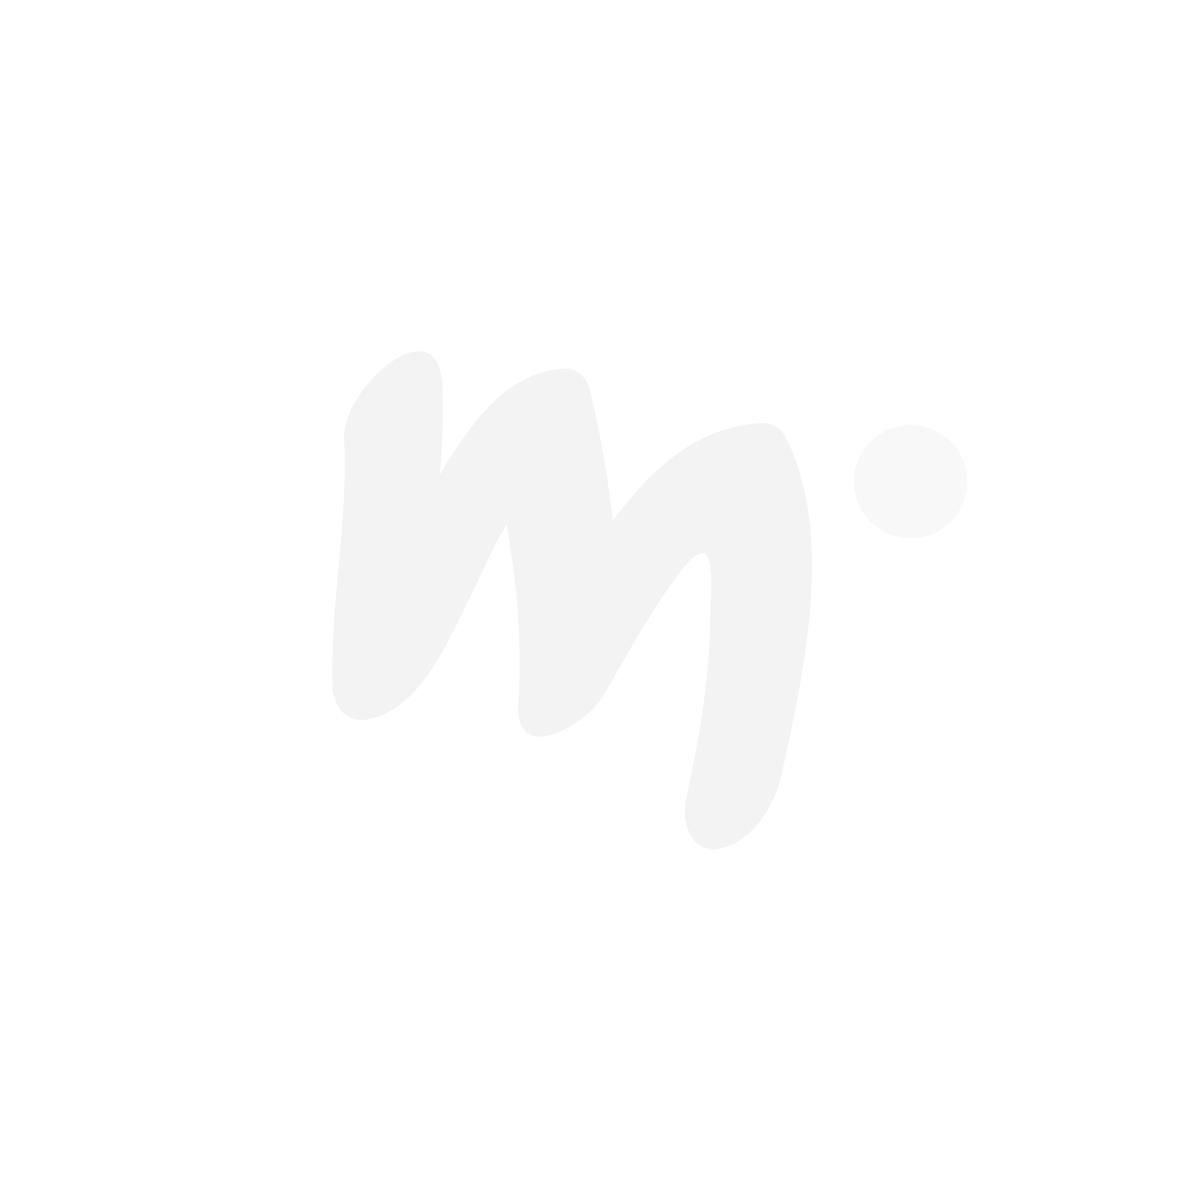 Peppi Pitkätossu Moniväri-huppupyyhe